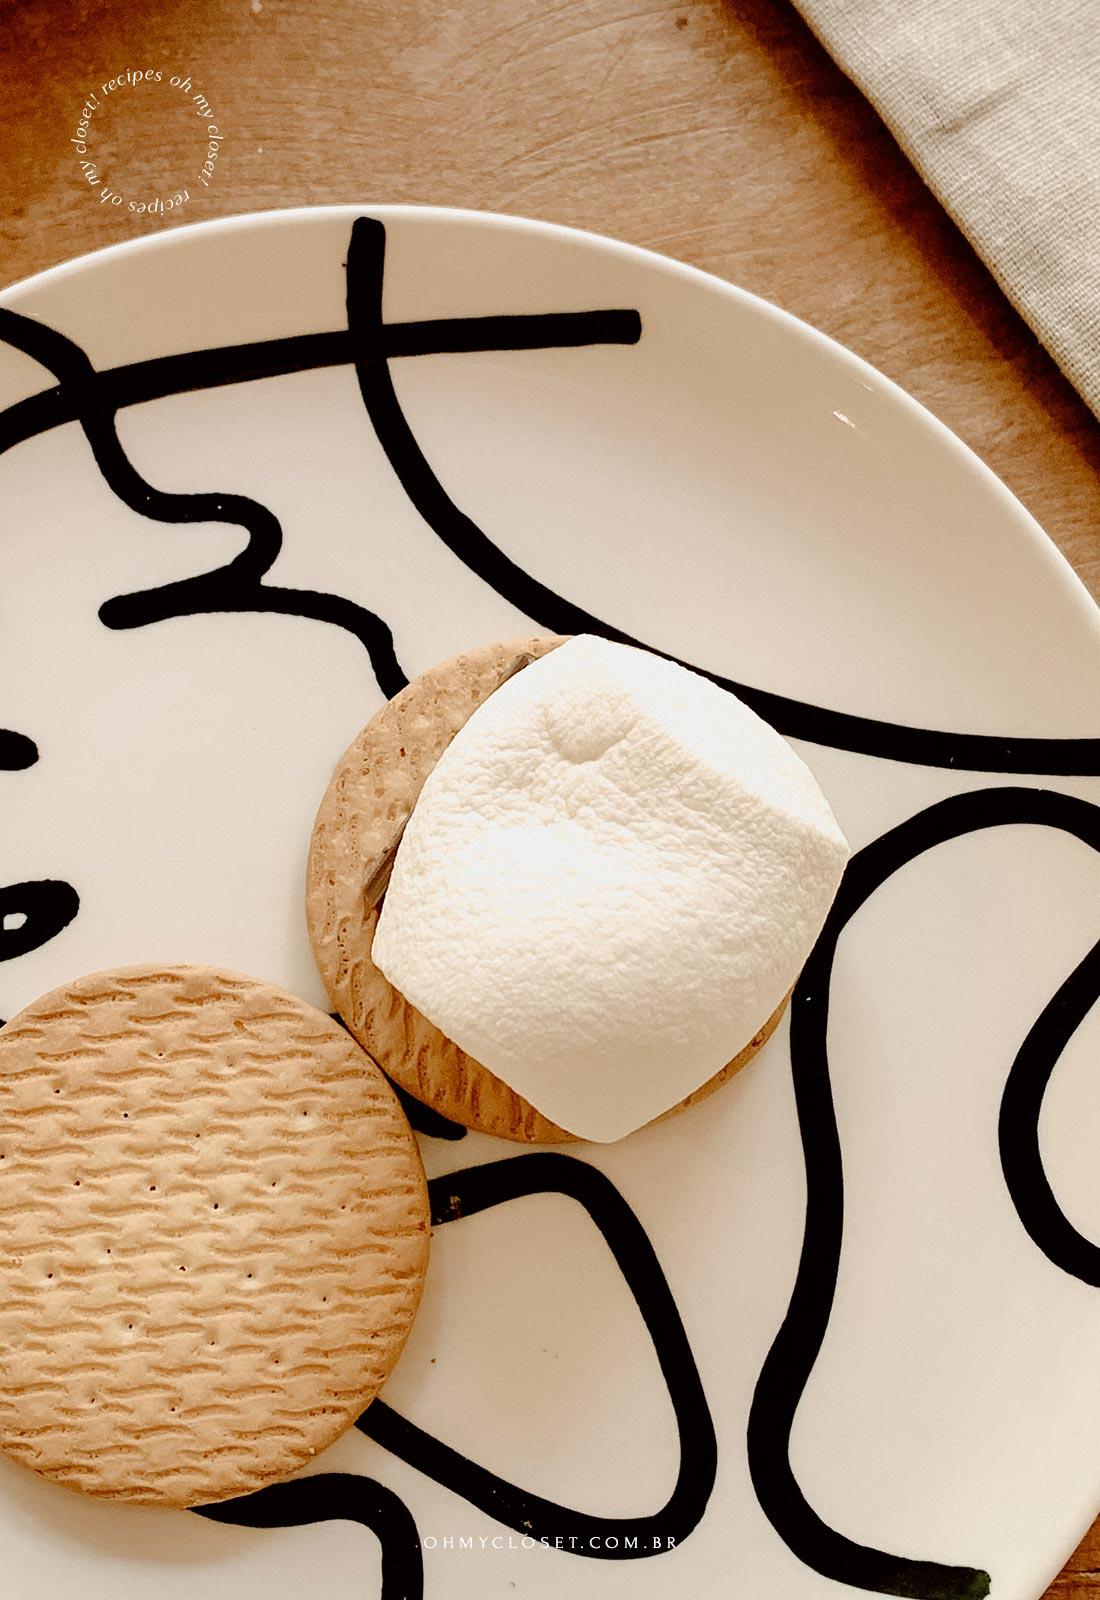 Marshmallow derretido no microondas.